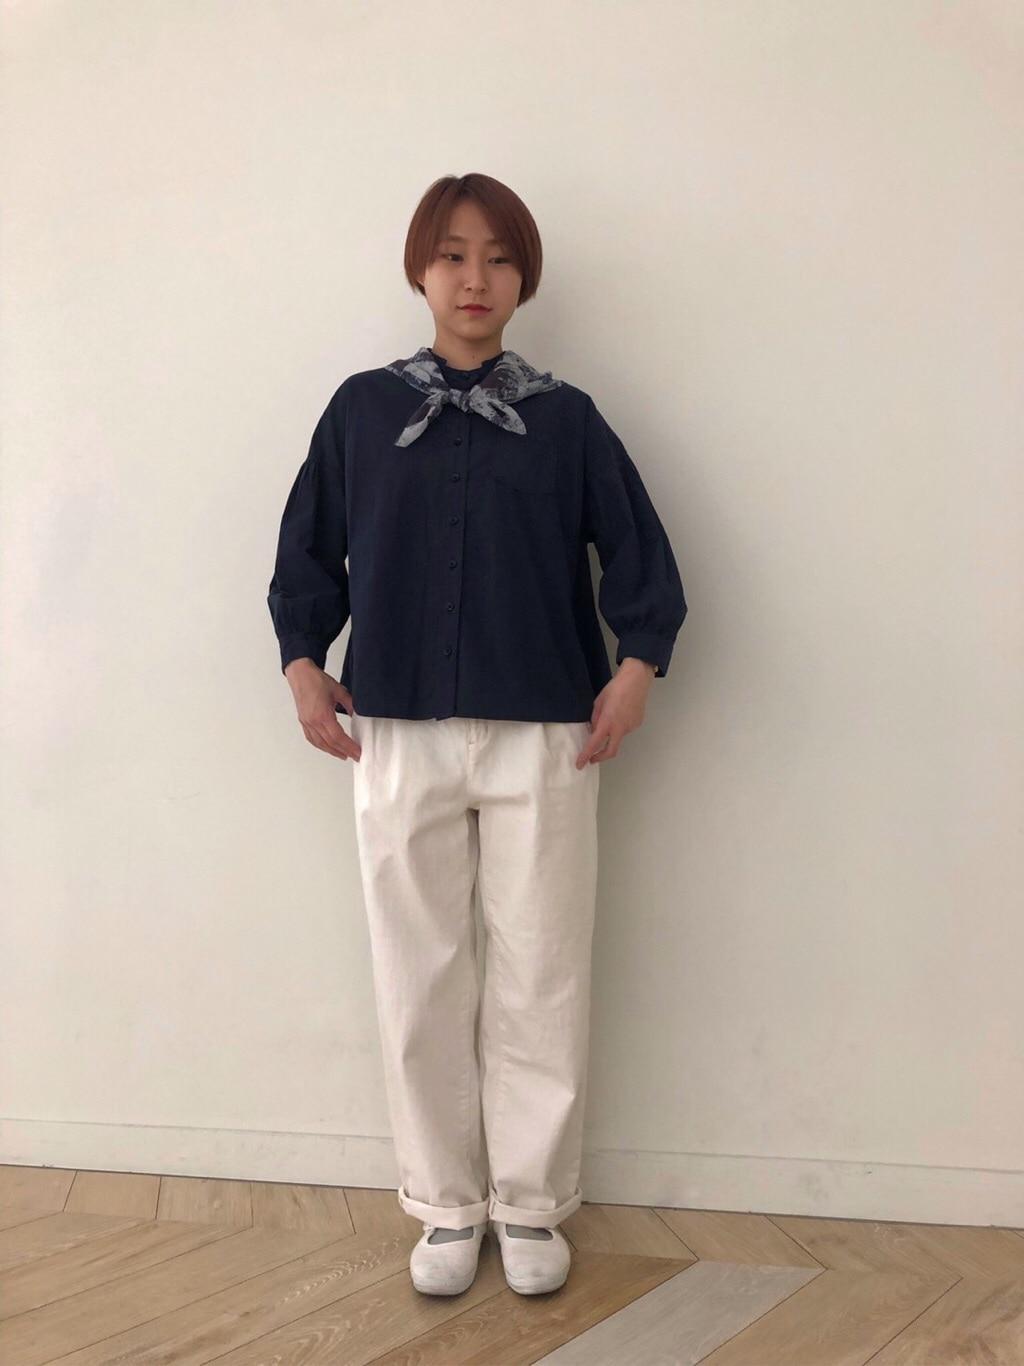 bulle de savon 吉祥寺パルコ 身長:158cm 2019.07.08